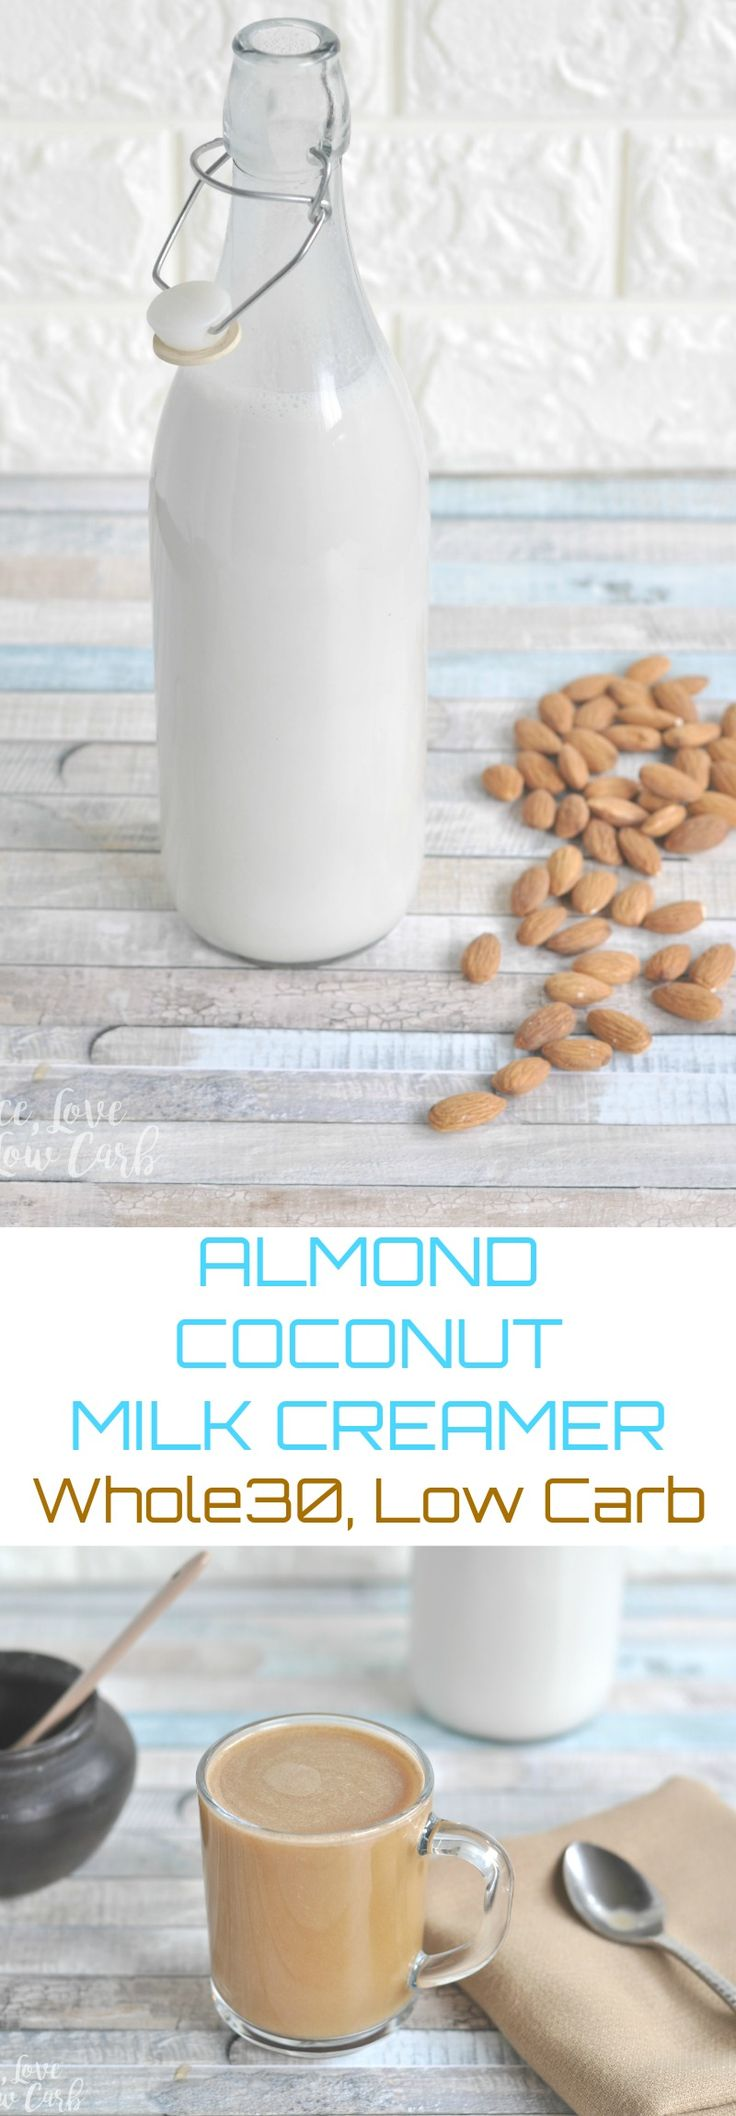 Low Carb Whole30 Almond Coconut Milk Creamer via @PeaceLoveLoCarb